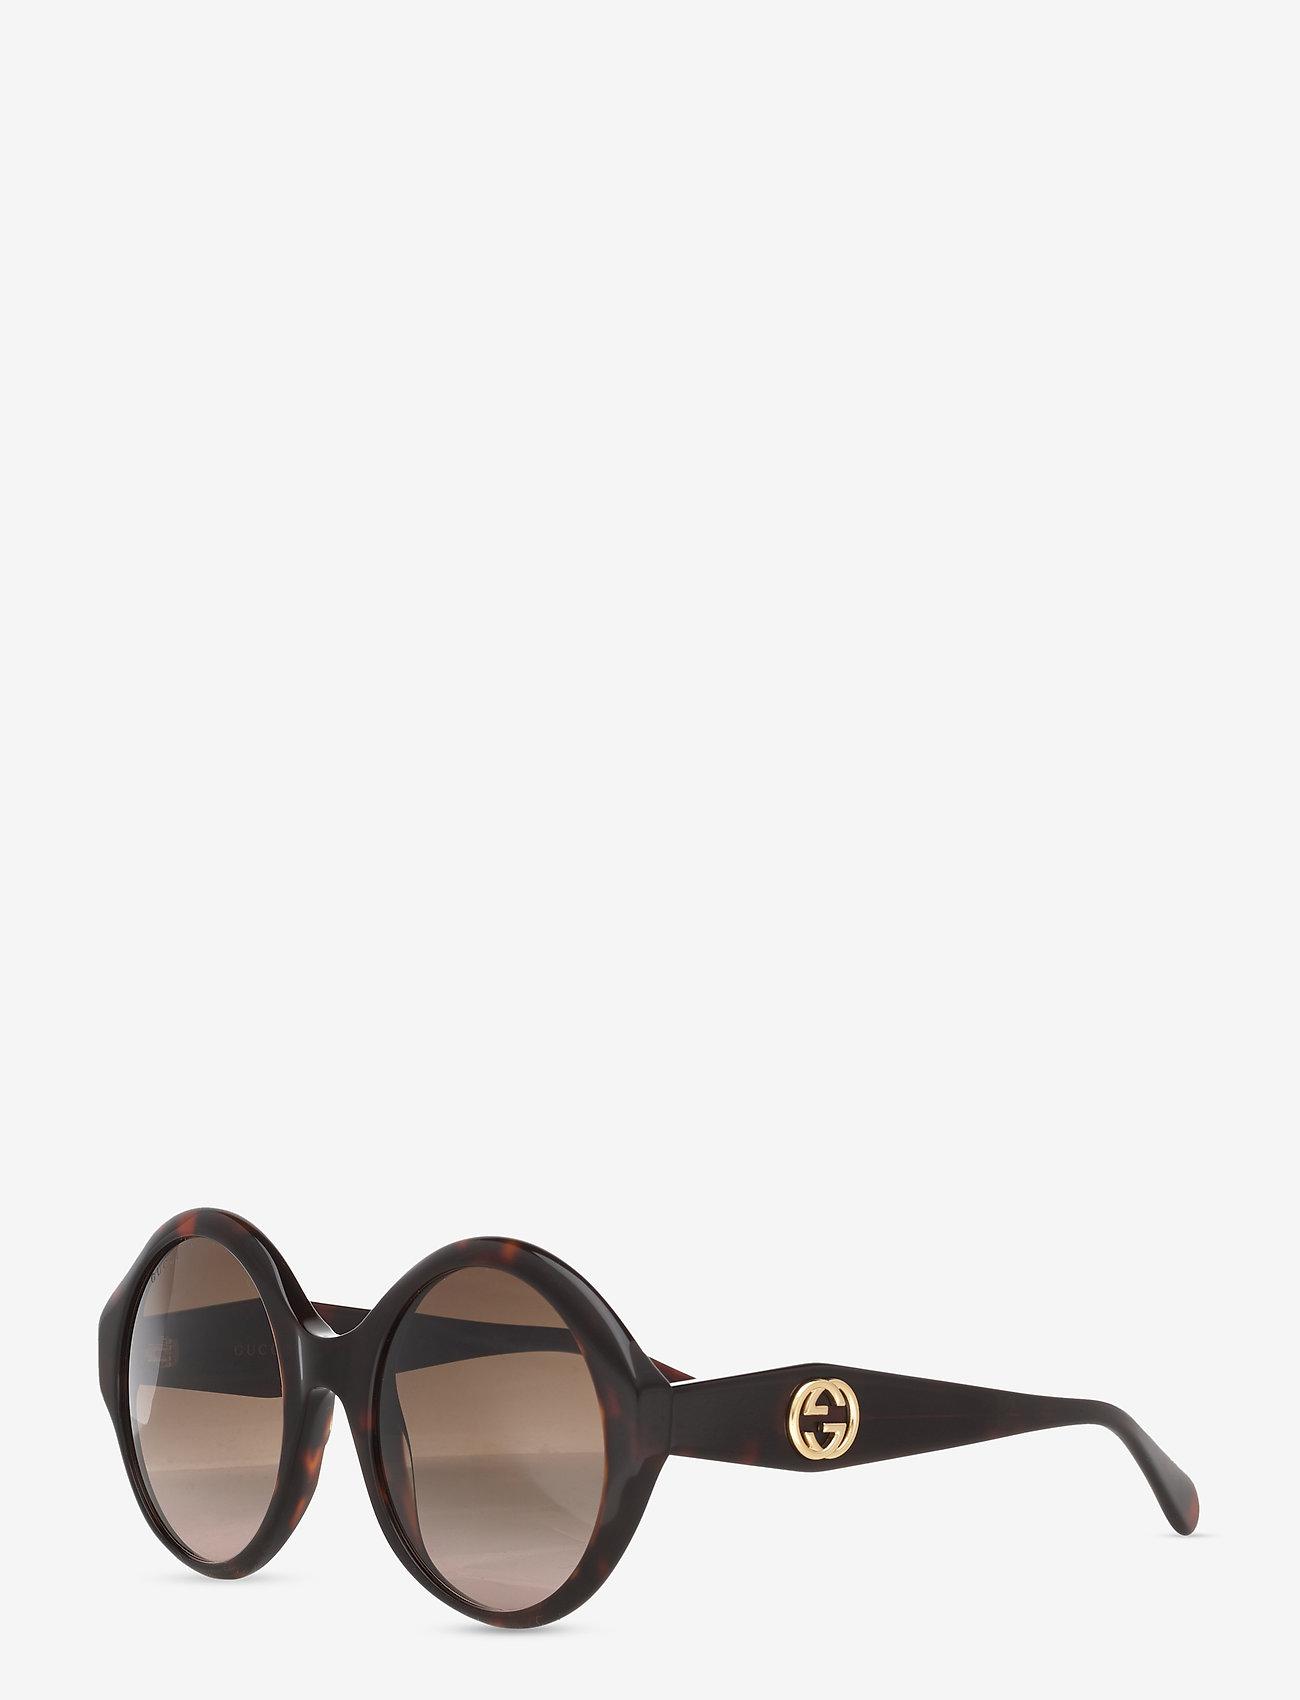 Gucci Sunglasses - GG0797S - rond model - havana-havana-brown - 1